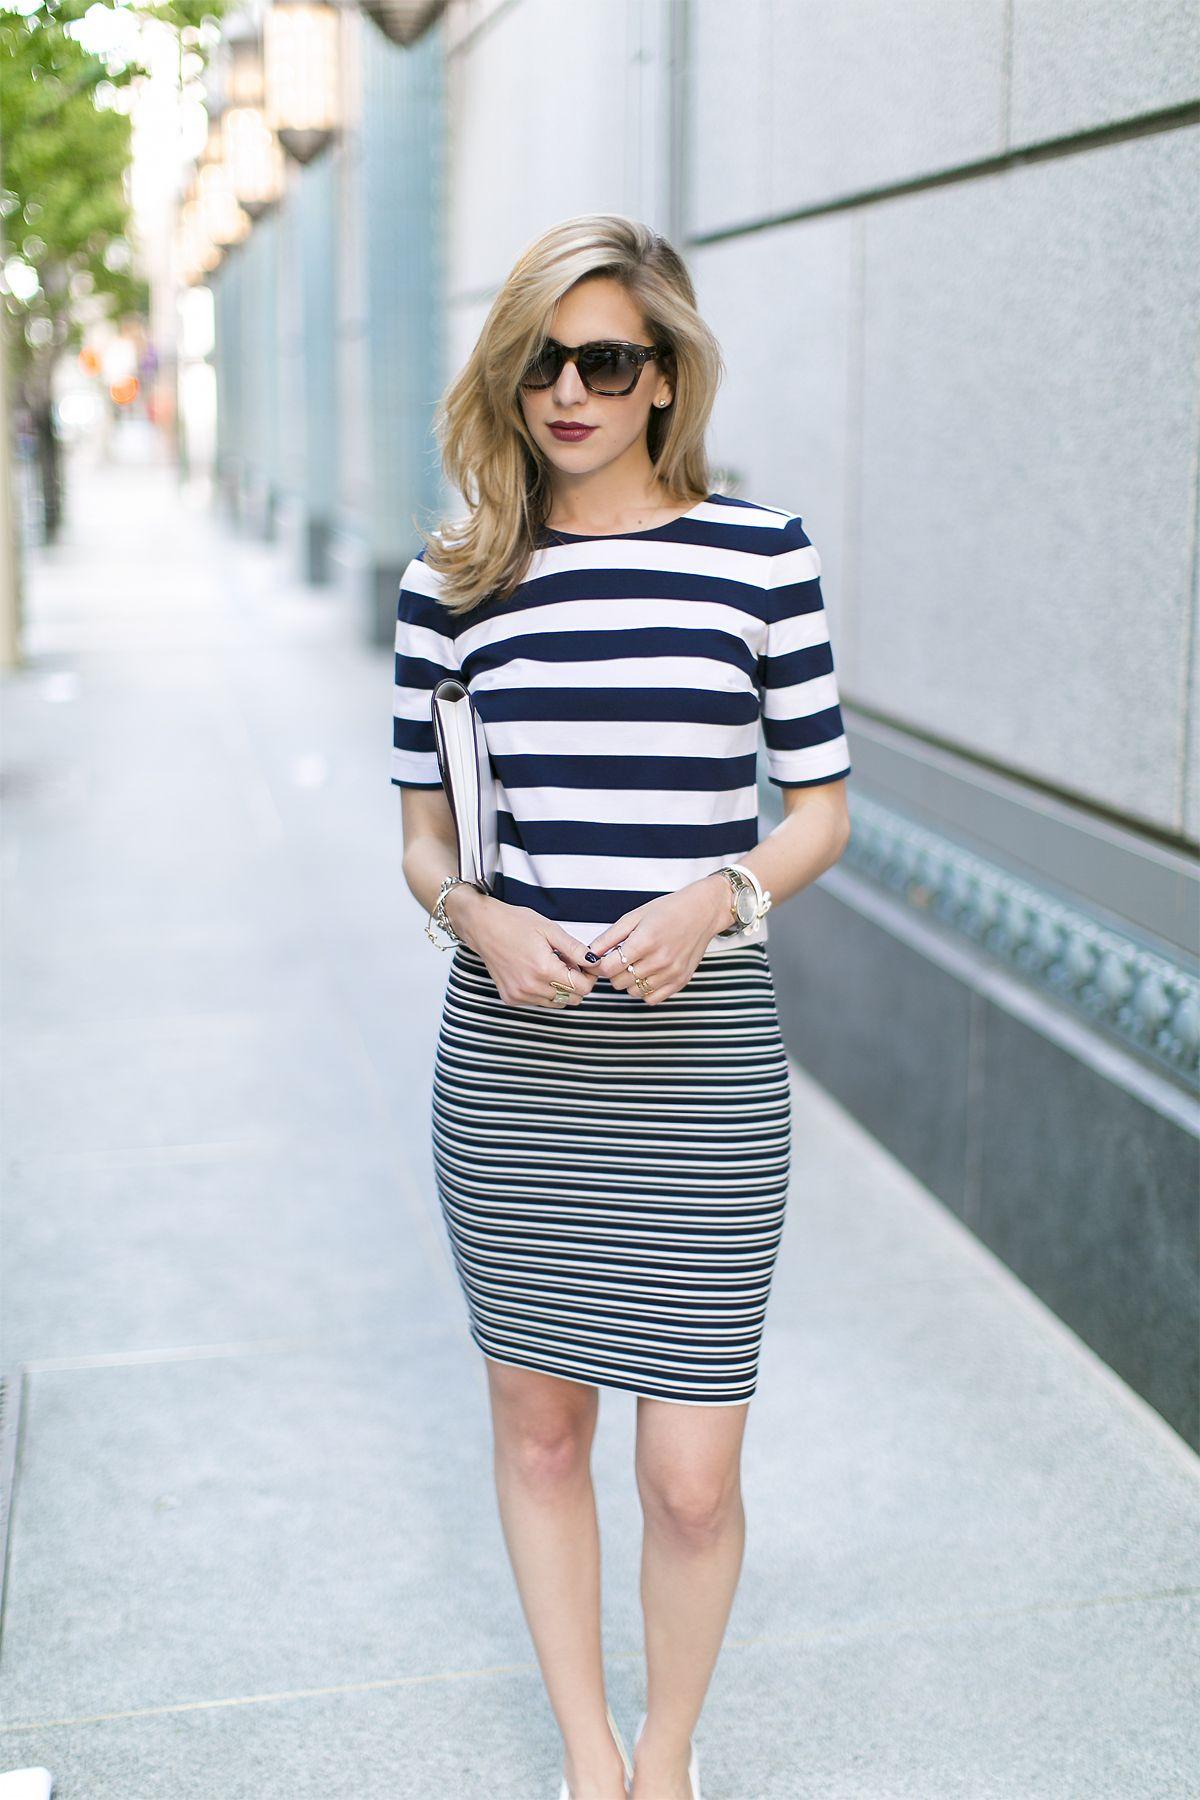 cc65949eae how to wear stripes on stripes